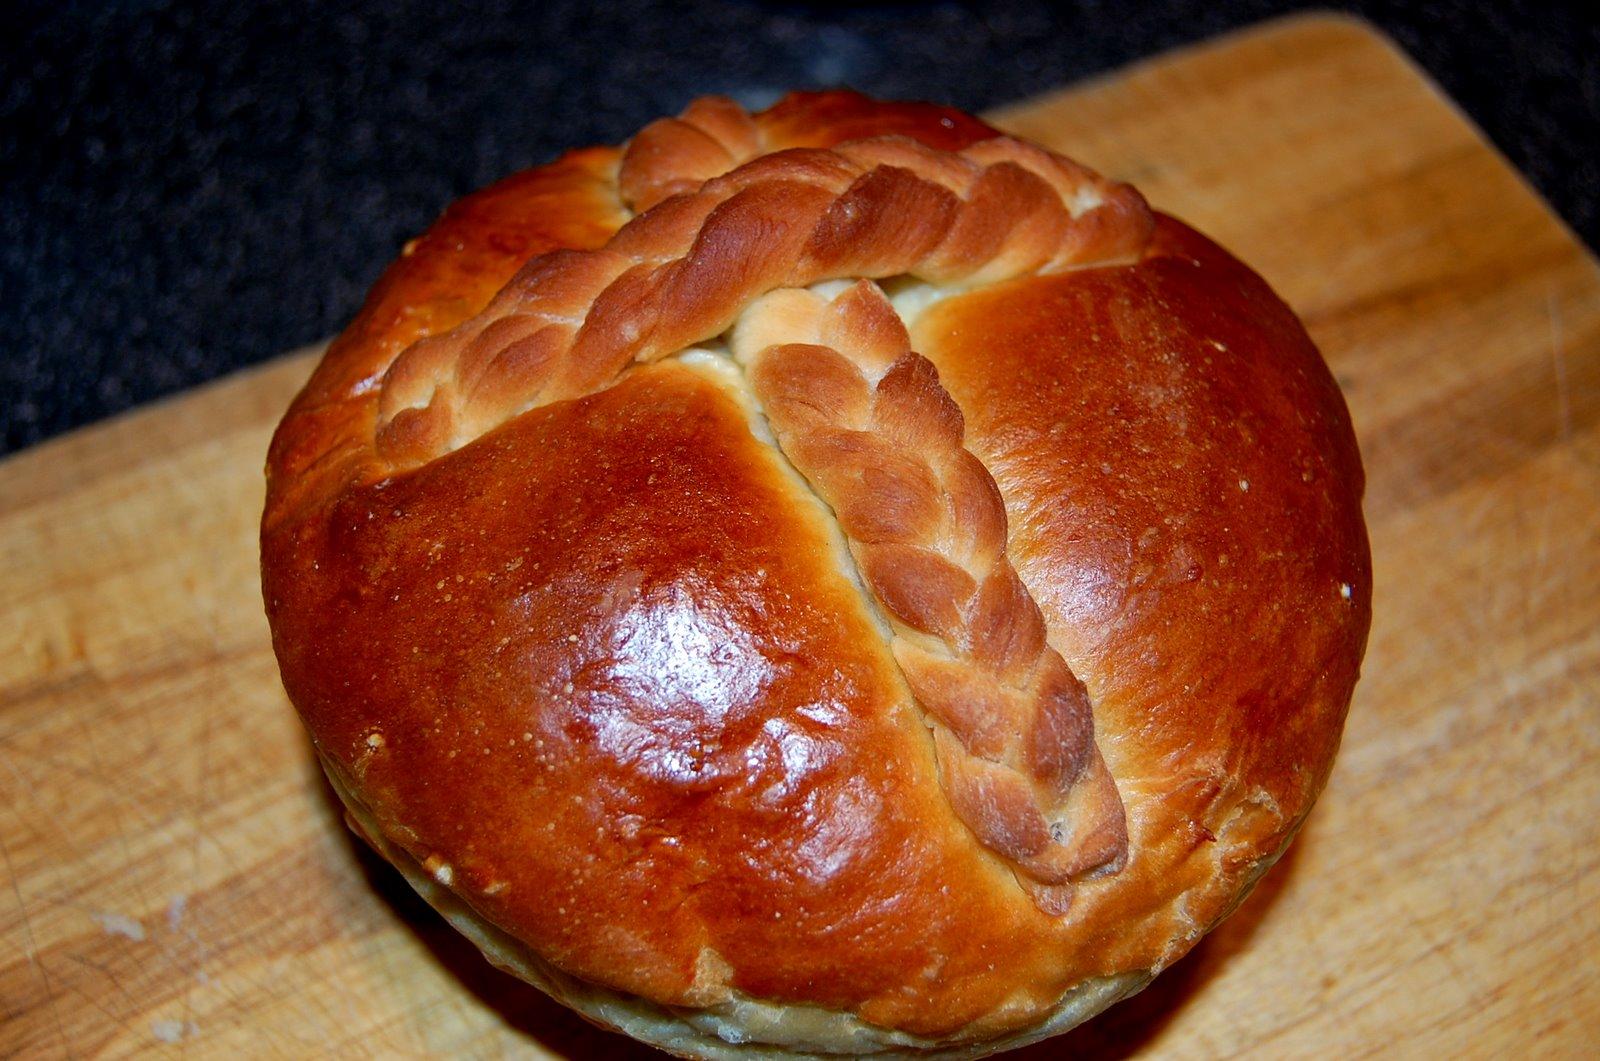 Opinions on paska bread